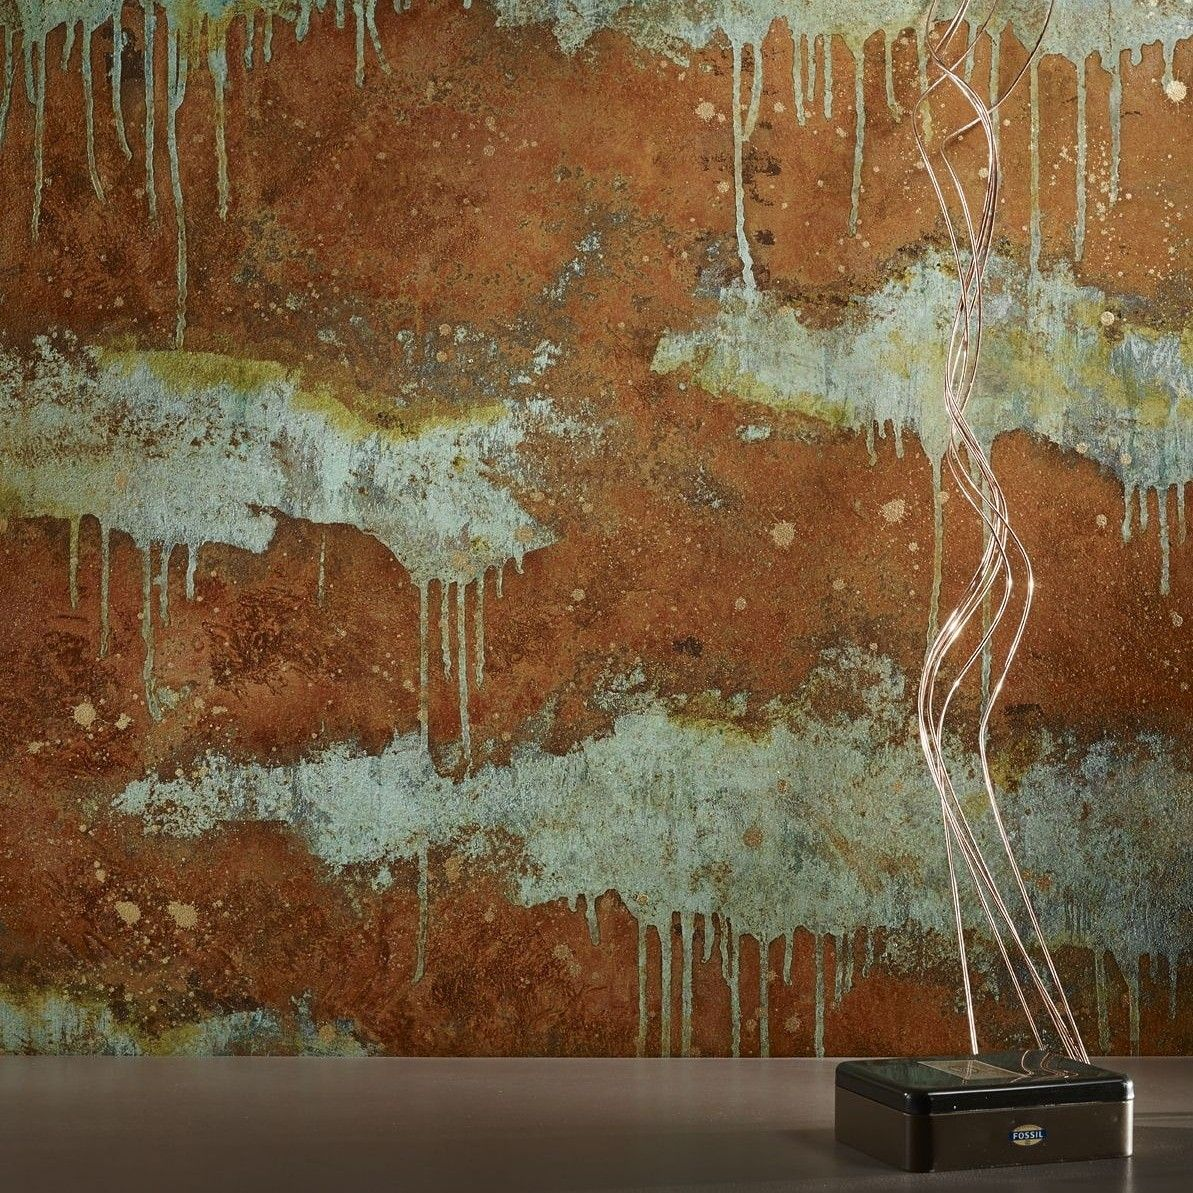 Exterior Walldesign Ideas: #navdecor #interiordesign #tasarim #interior #decoration